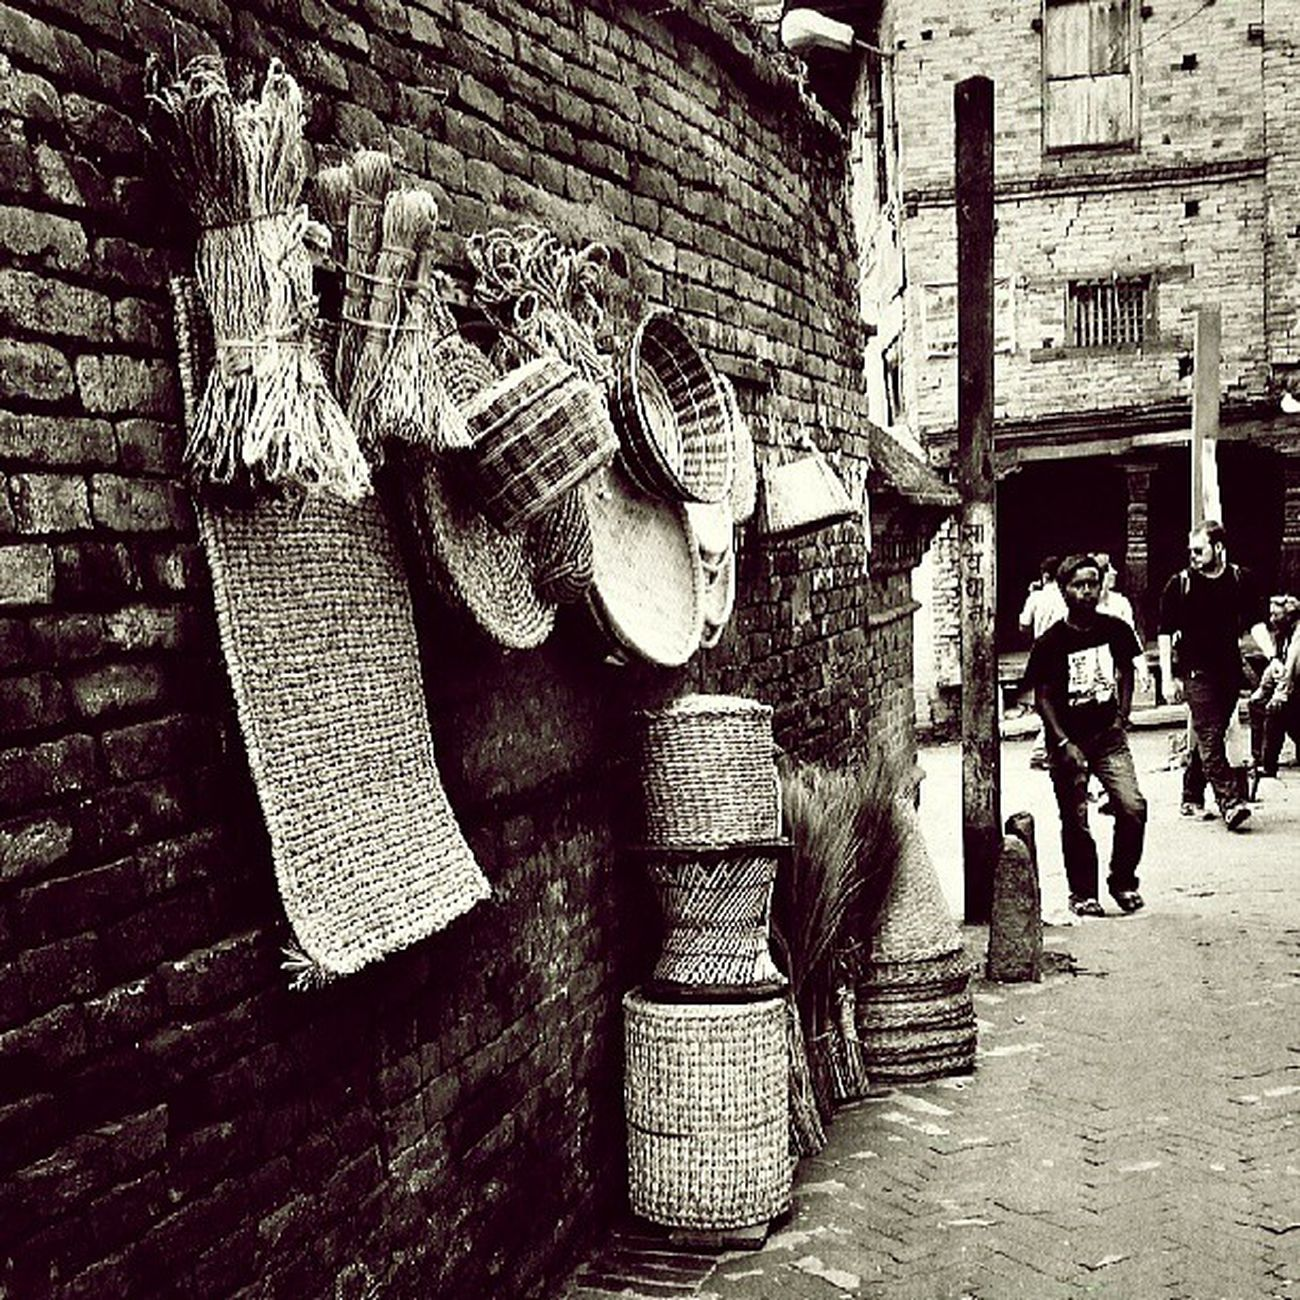 Bhaktapur Handicrafts Strawmats Broom nepali culture tradition nepal nepalinpictures nepaliphotography nepaliphotographer tagsforlike follow followme picoftheday photooftheday blackandwhite bnw street freeyourmind instaphoto insta_nepali instapic instaasia namaste_nepal